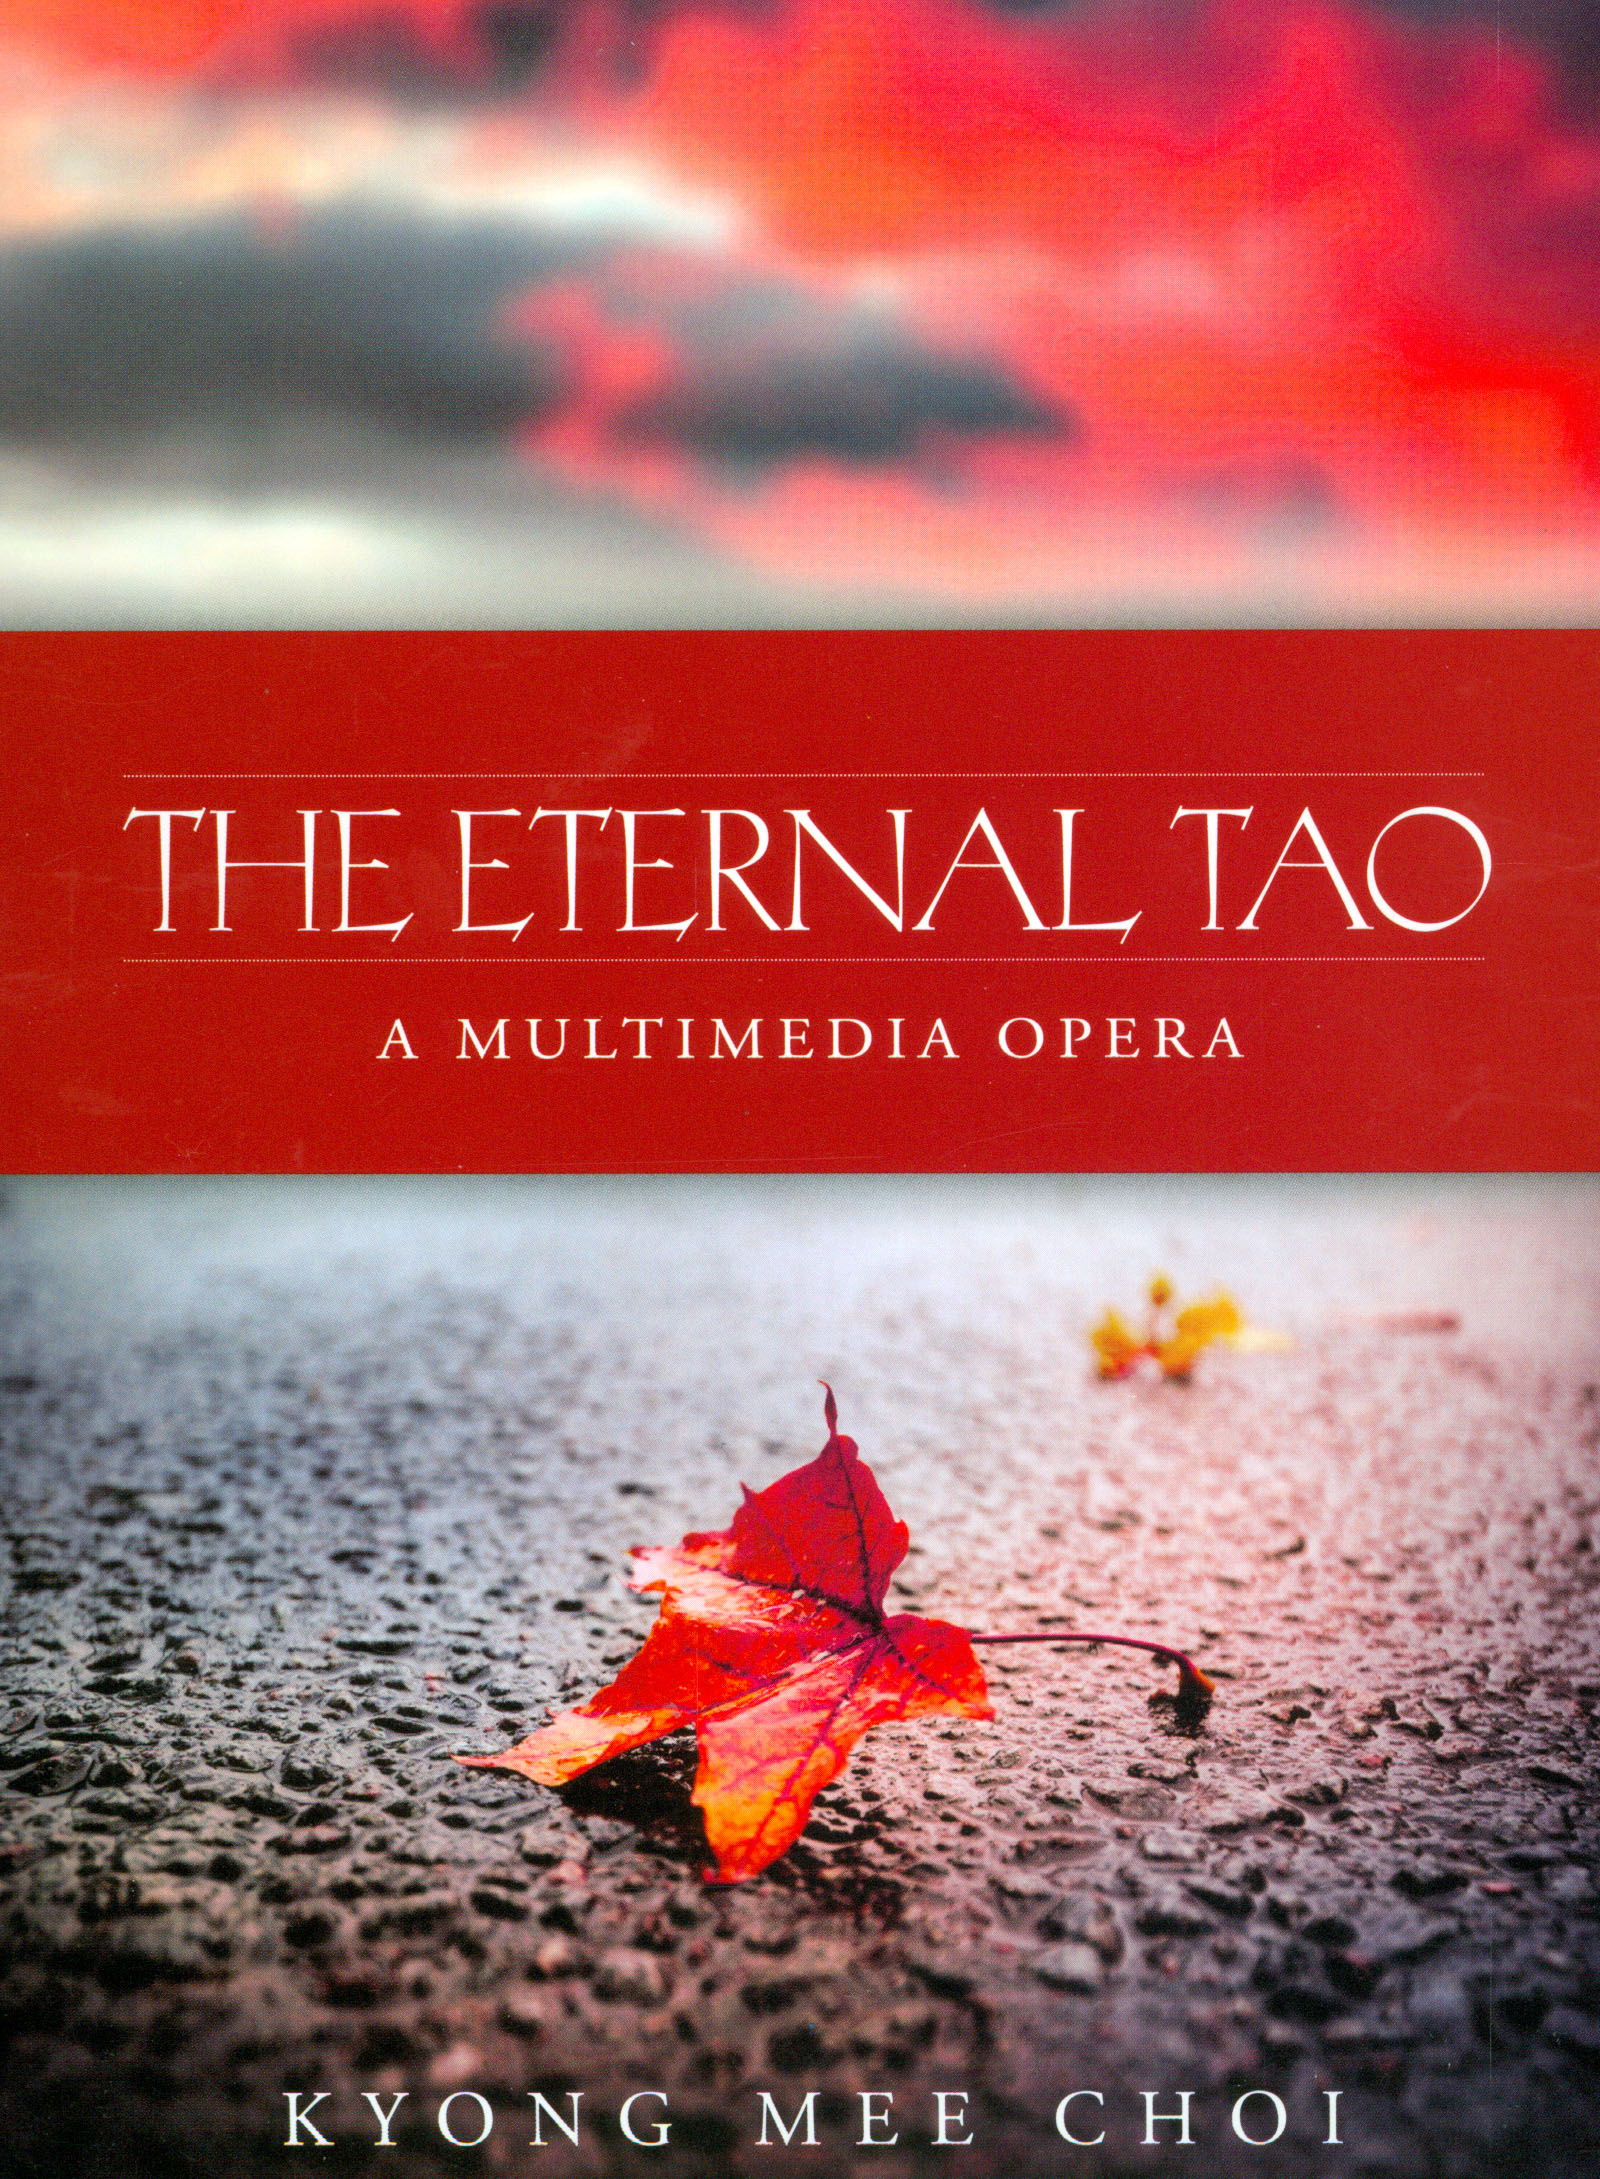 The Eternal Tao: A Multimedia Opera